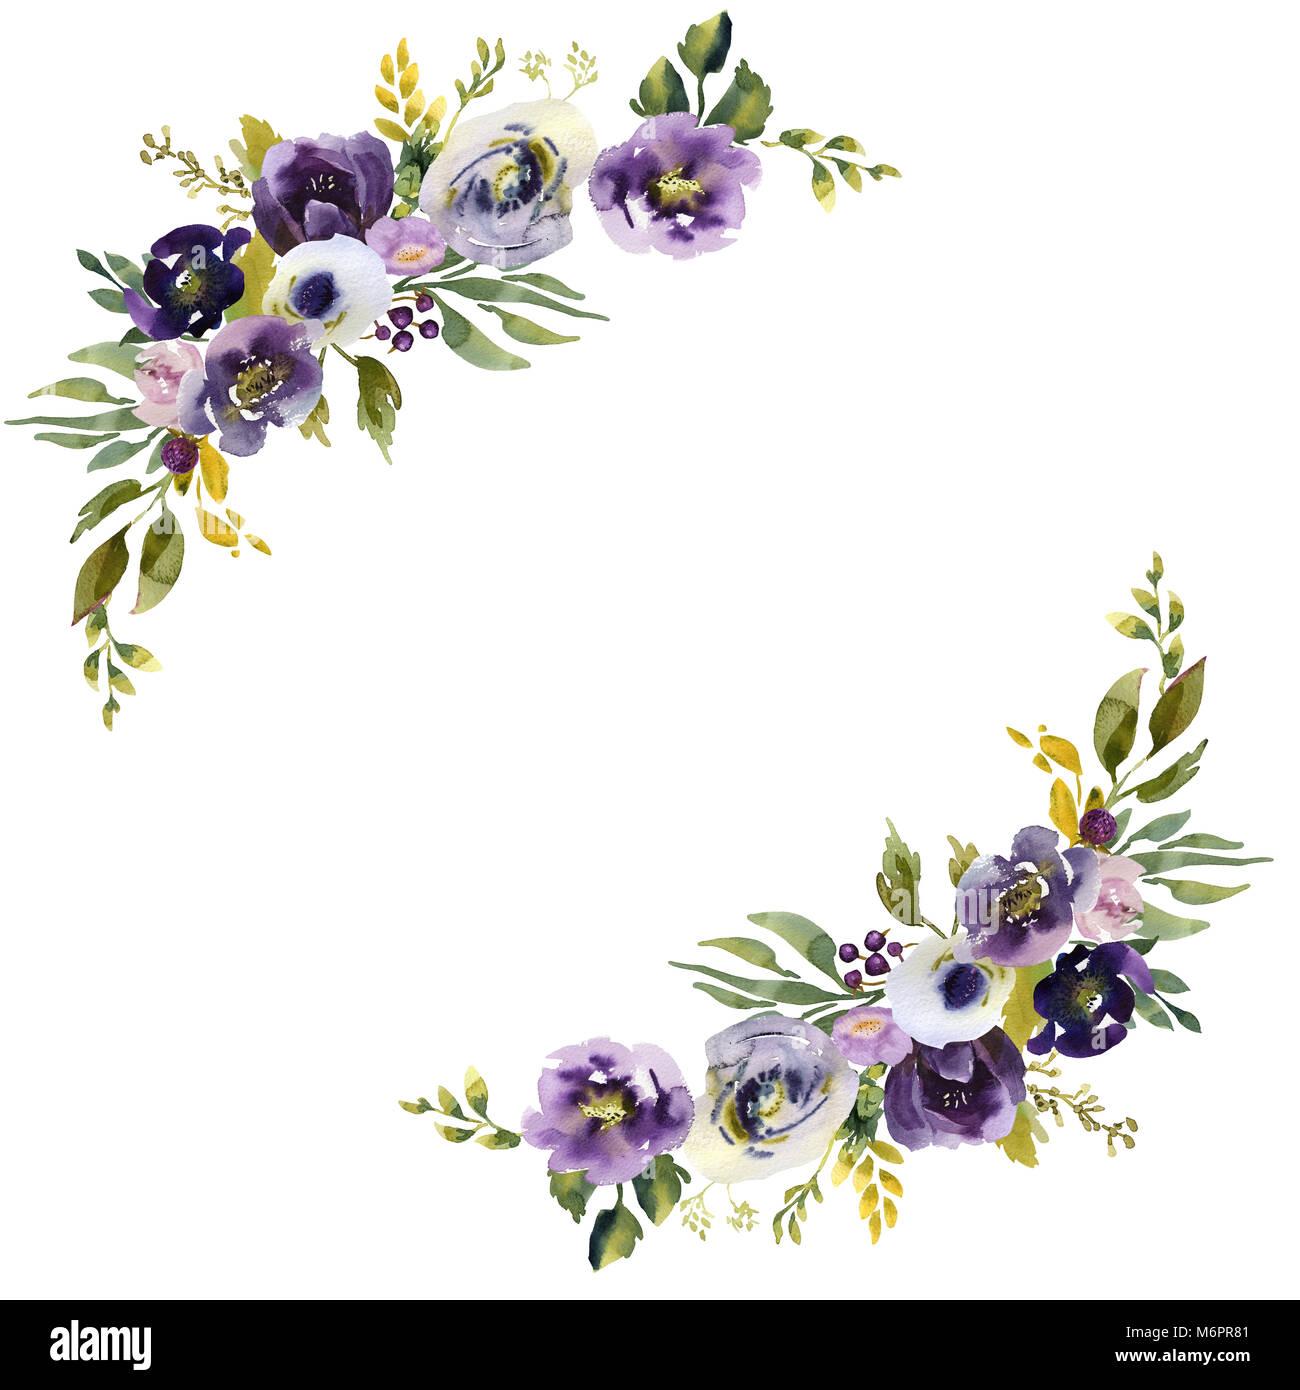 Wedding Purple Flowers: Wedding Frame Wreath Green And Purple Flowers Ornament